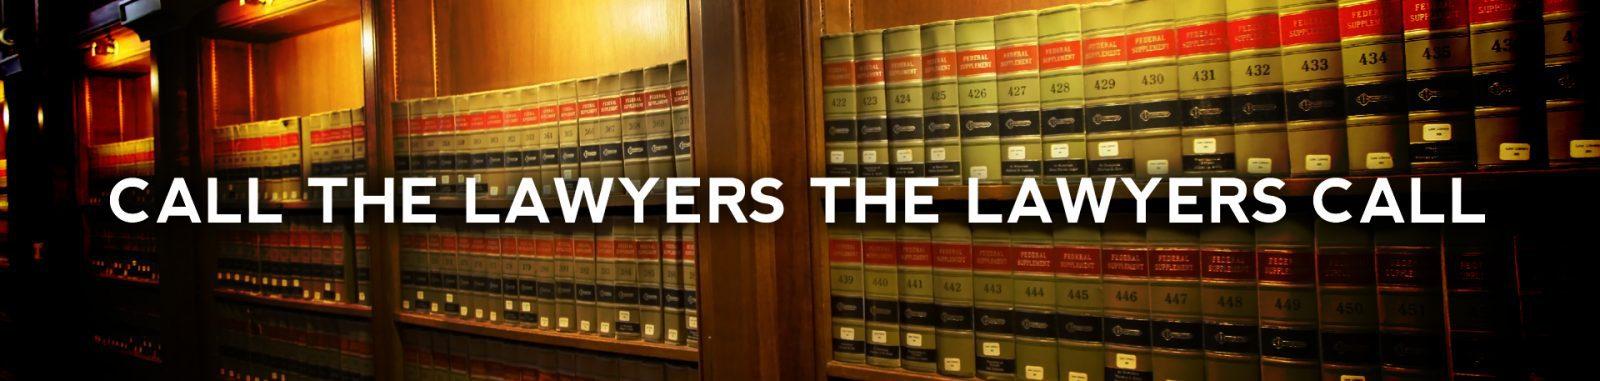 Hefferon Hefferon P.A. Attorneys At Law 2